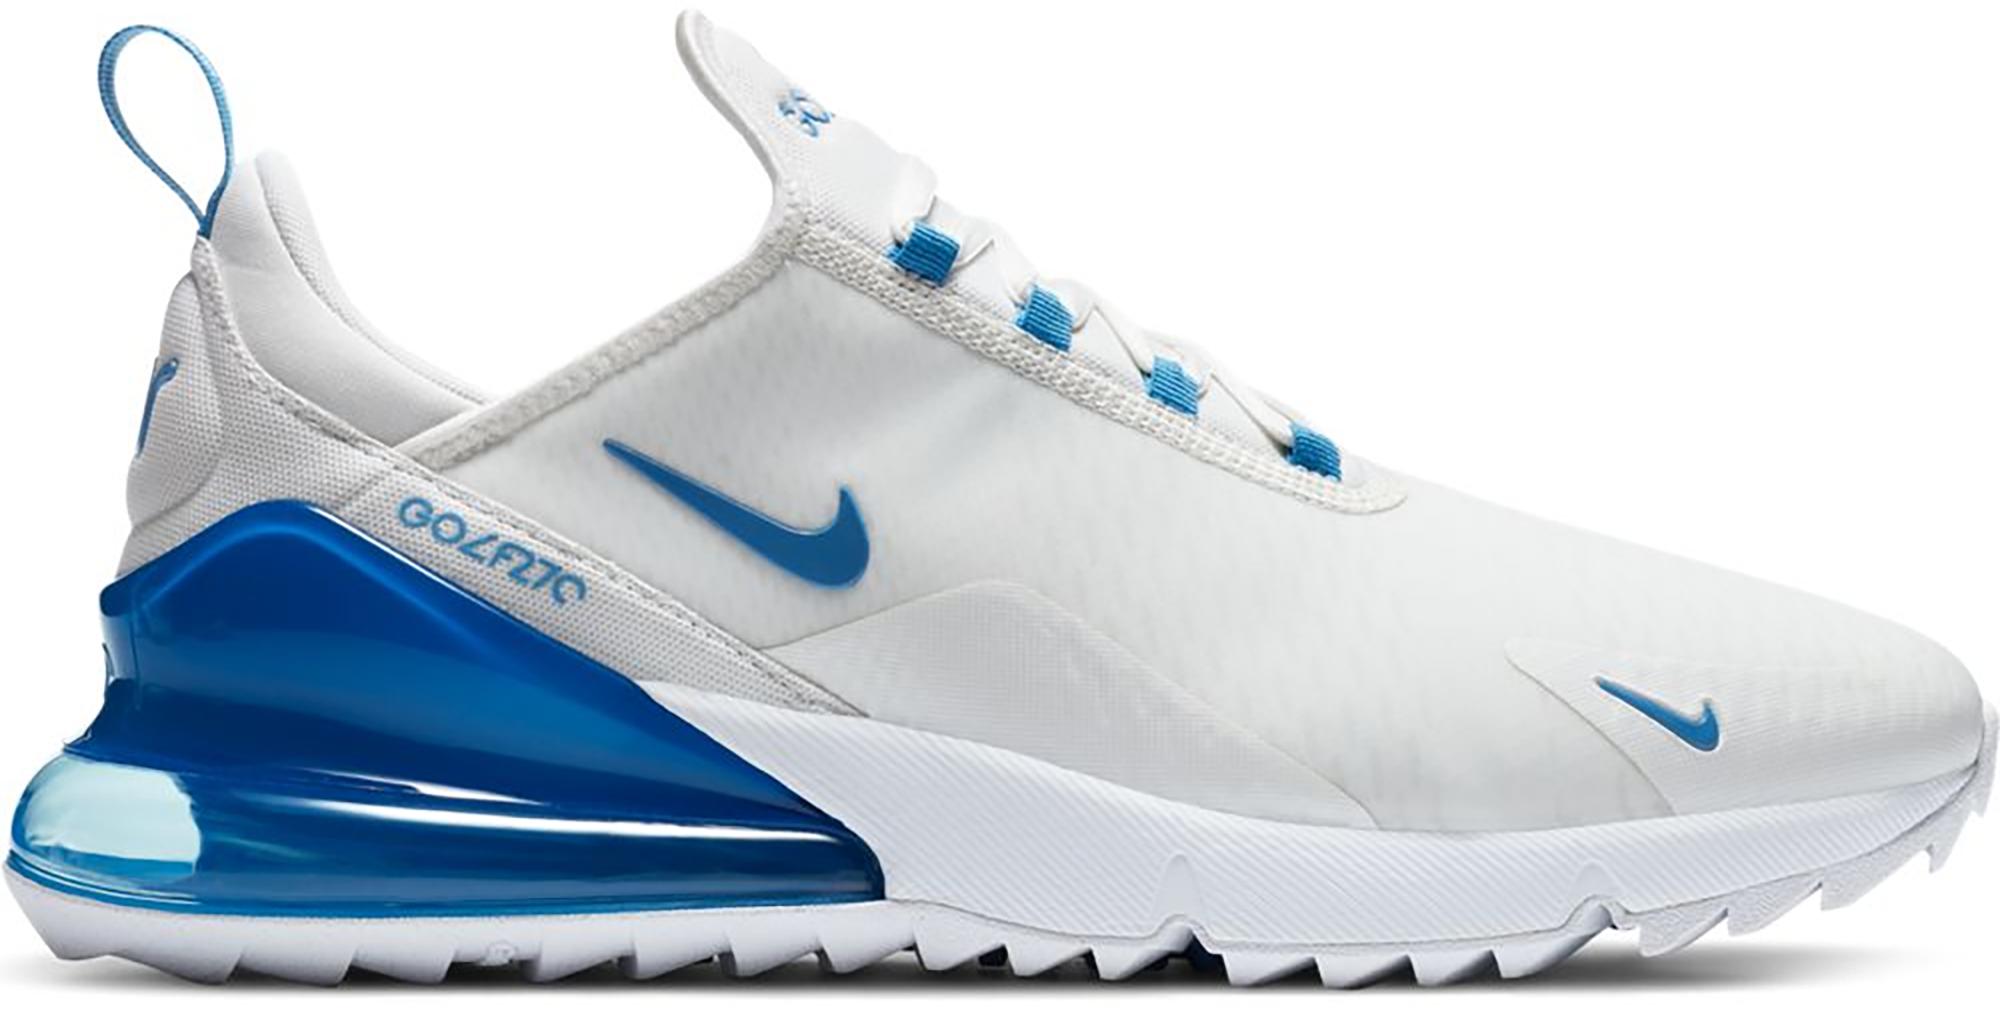 Nike Air Max 270 Golf White University